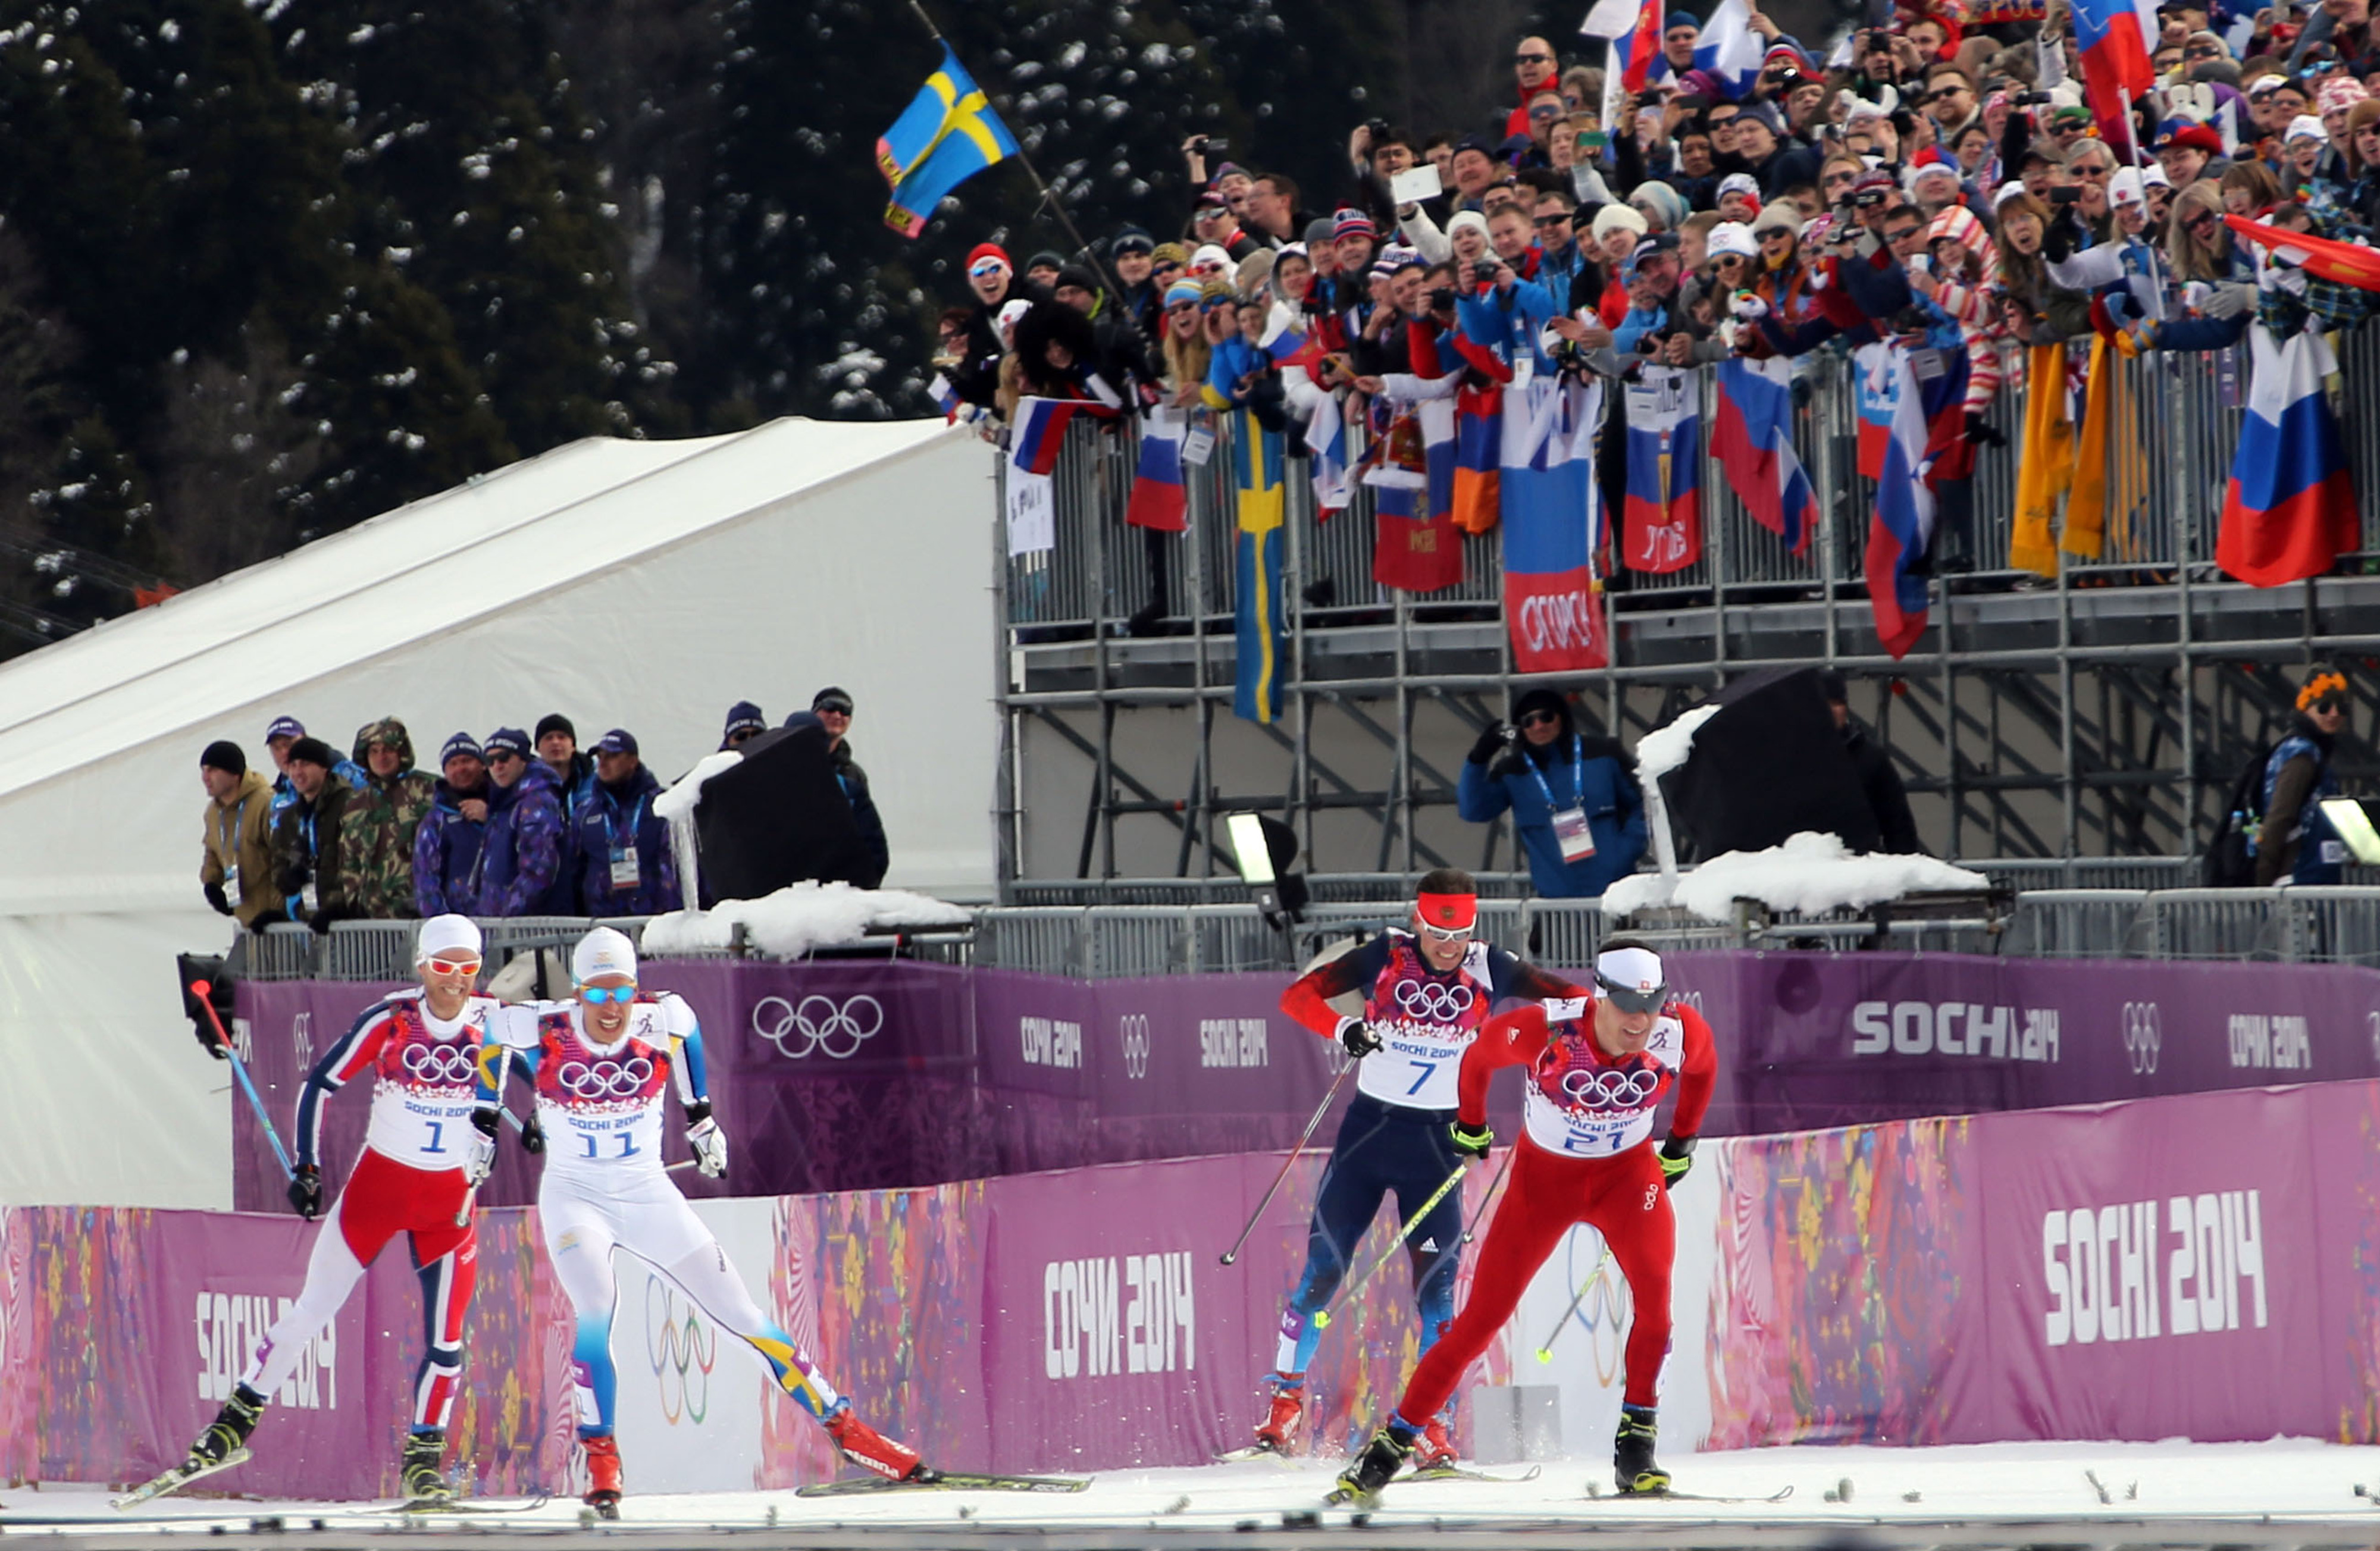 Winter Olympics 2014: Russia appeals medal decision in men's skiathlon